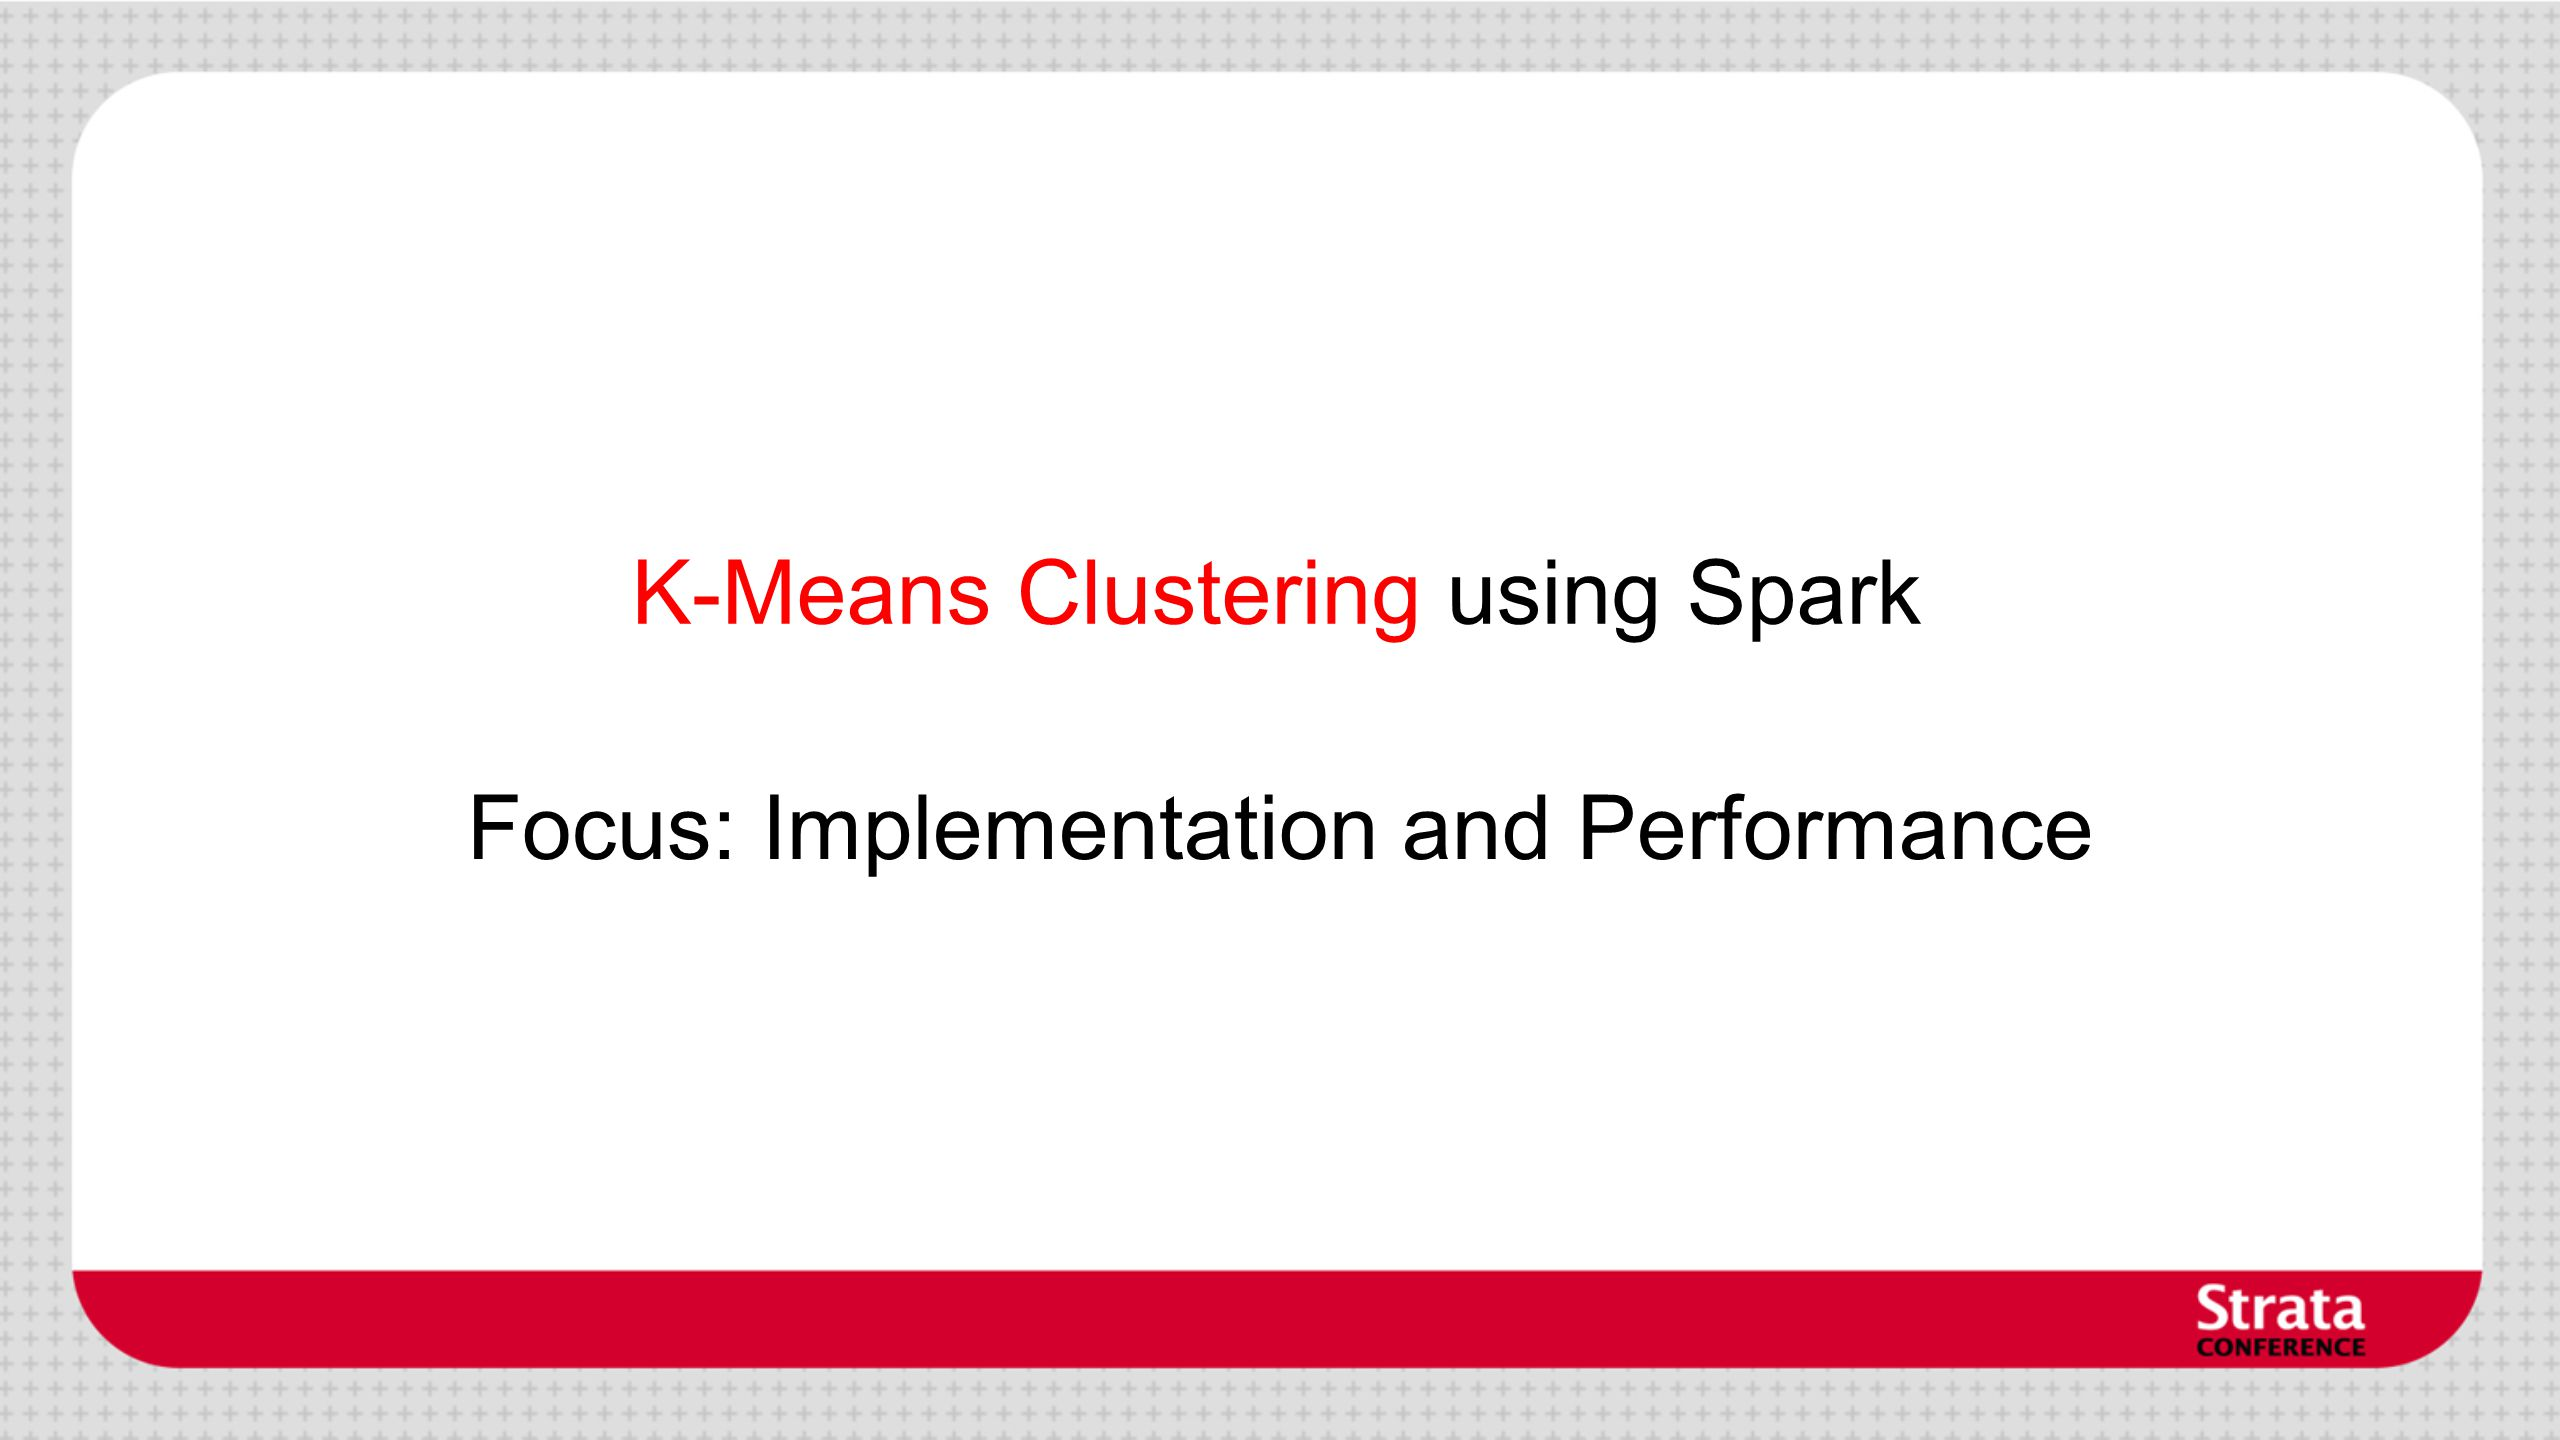 K-Means Clustering using Spark